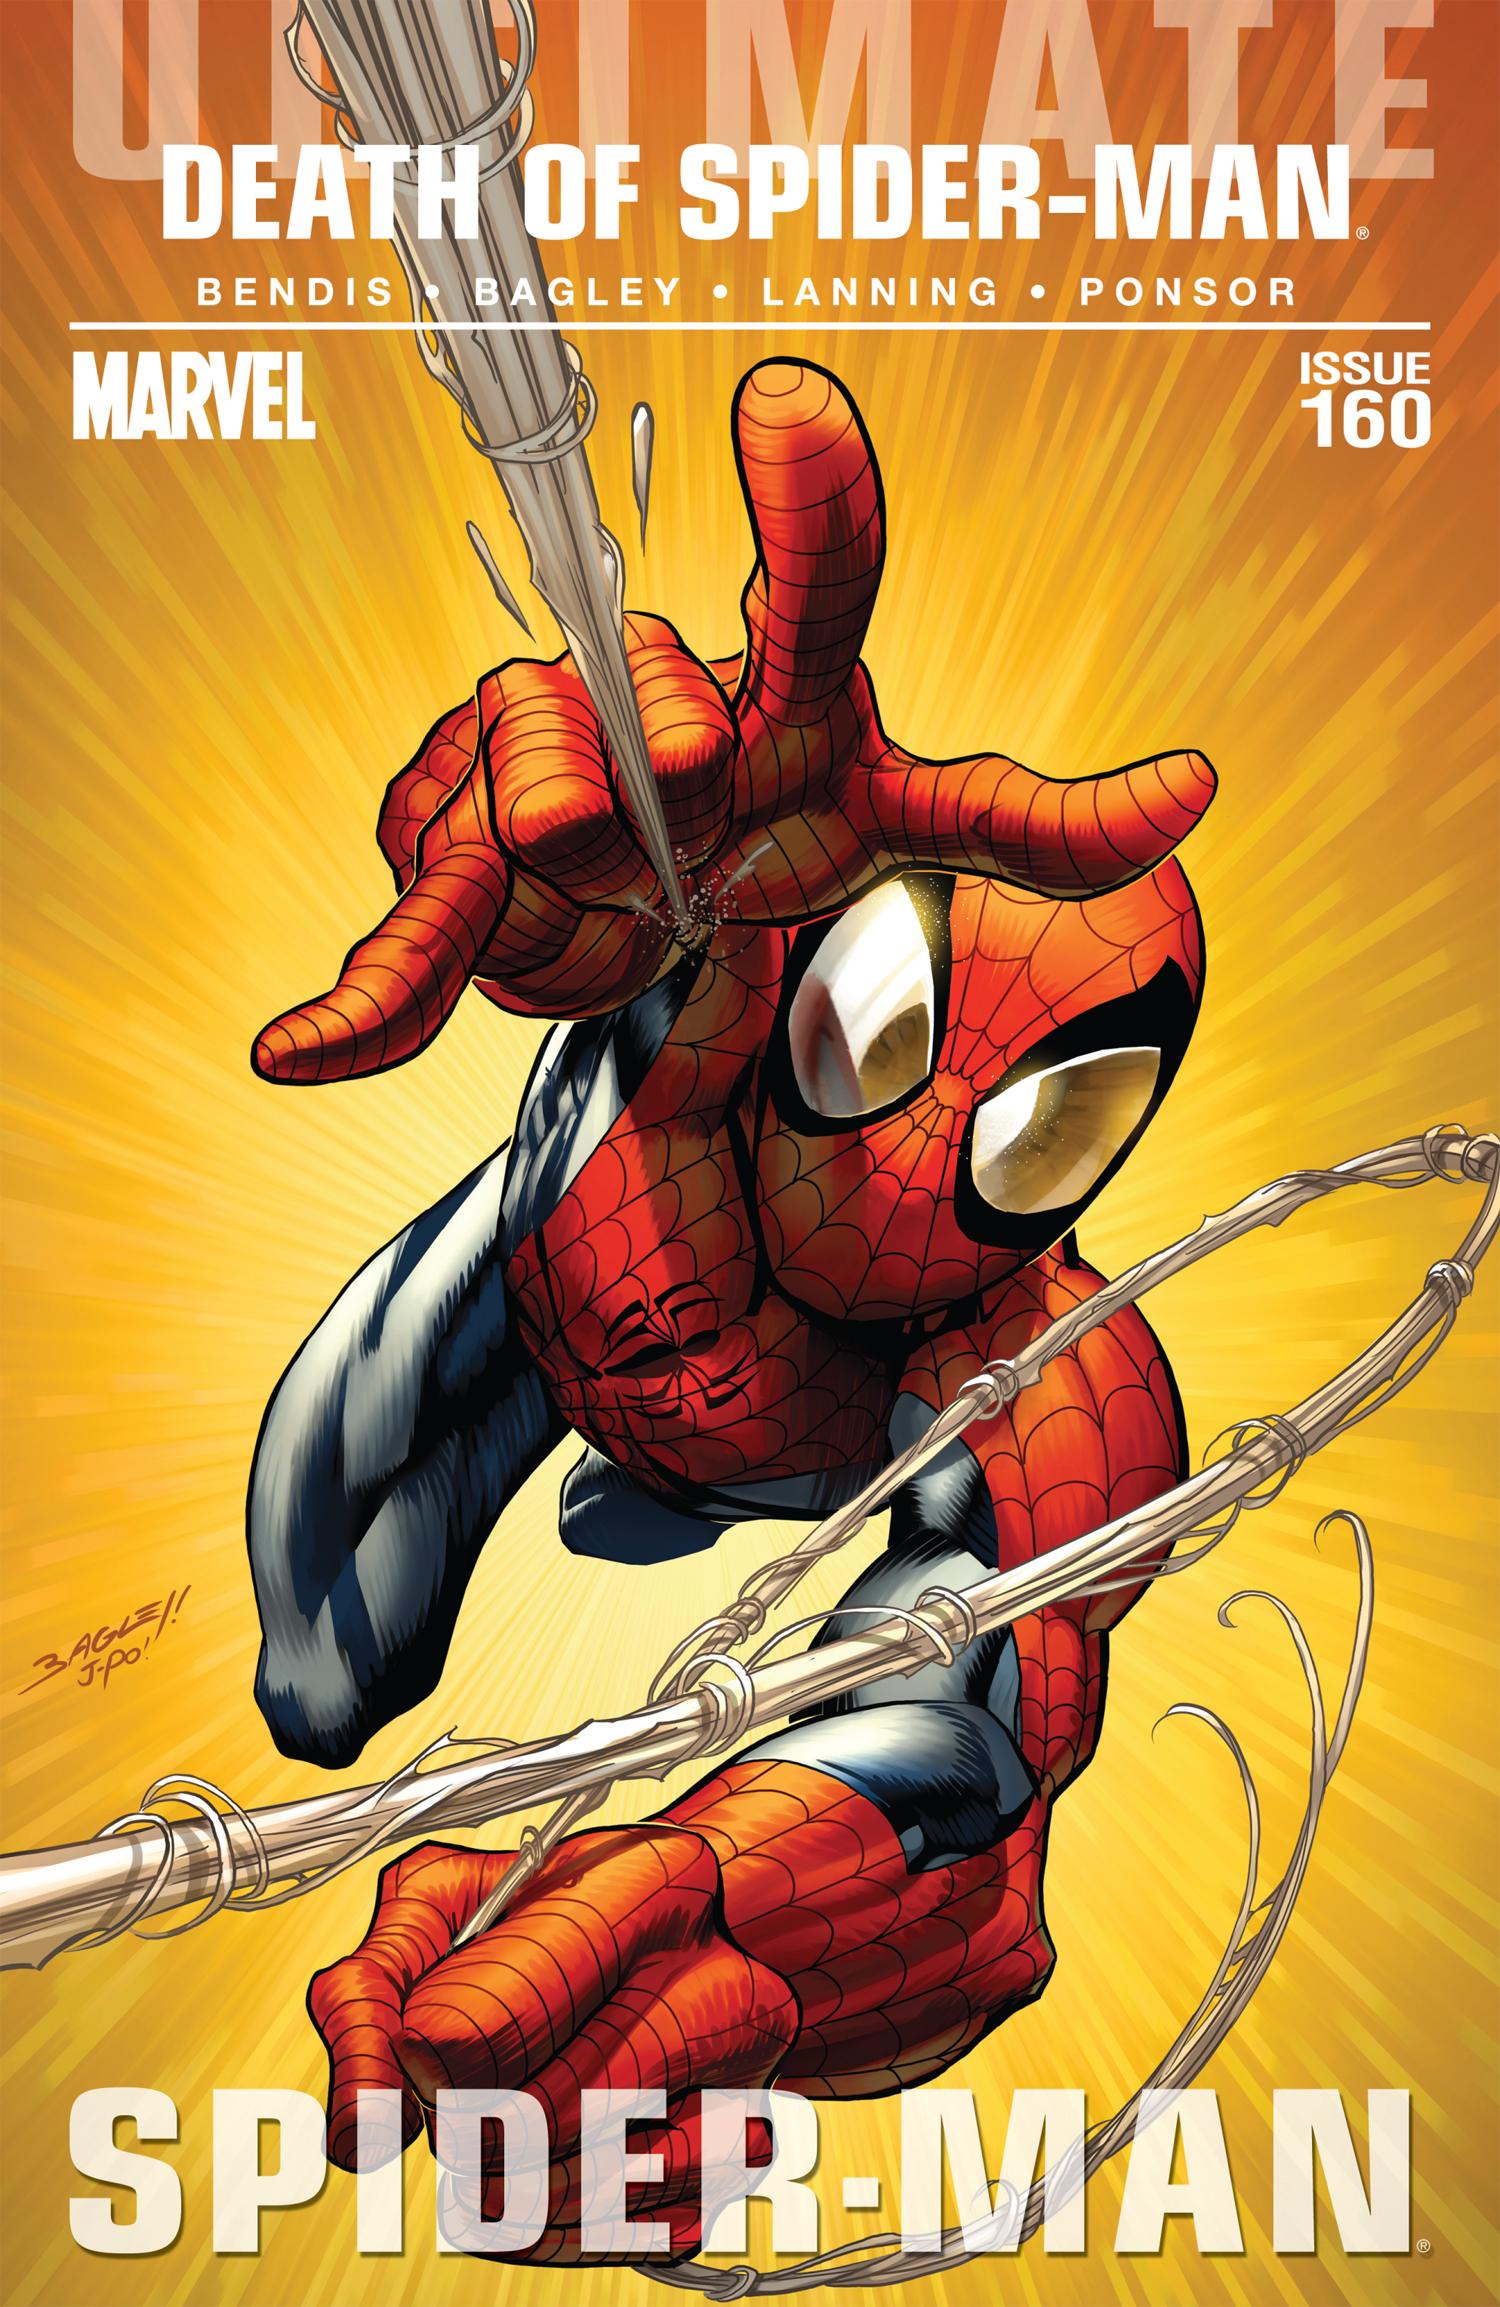 Ultimate Comics Spider-Man (2009) #160